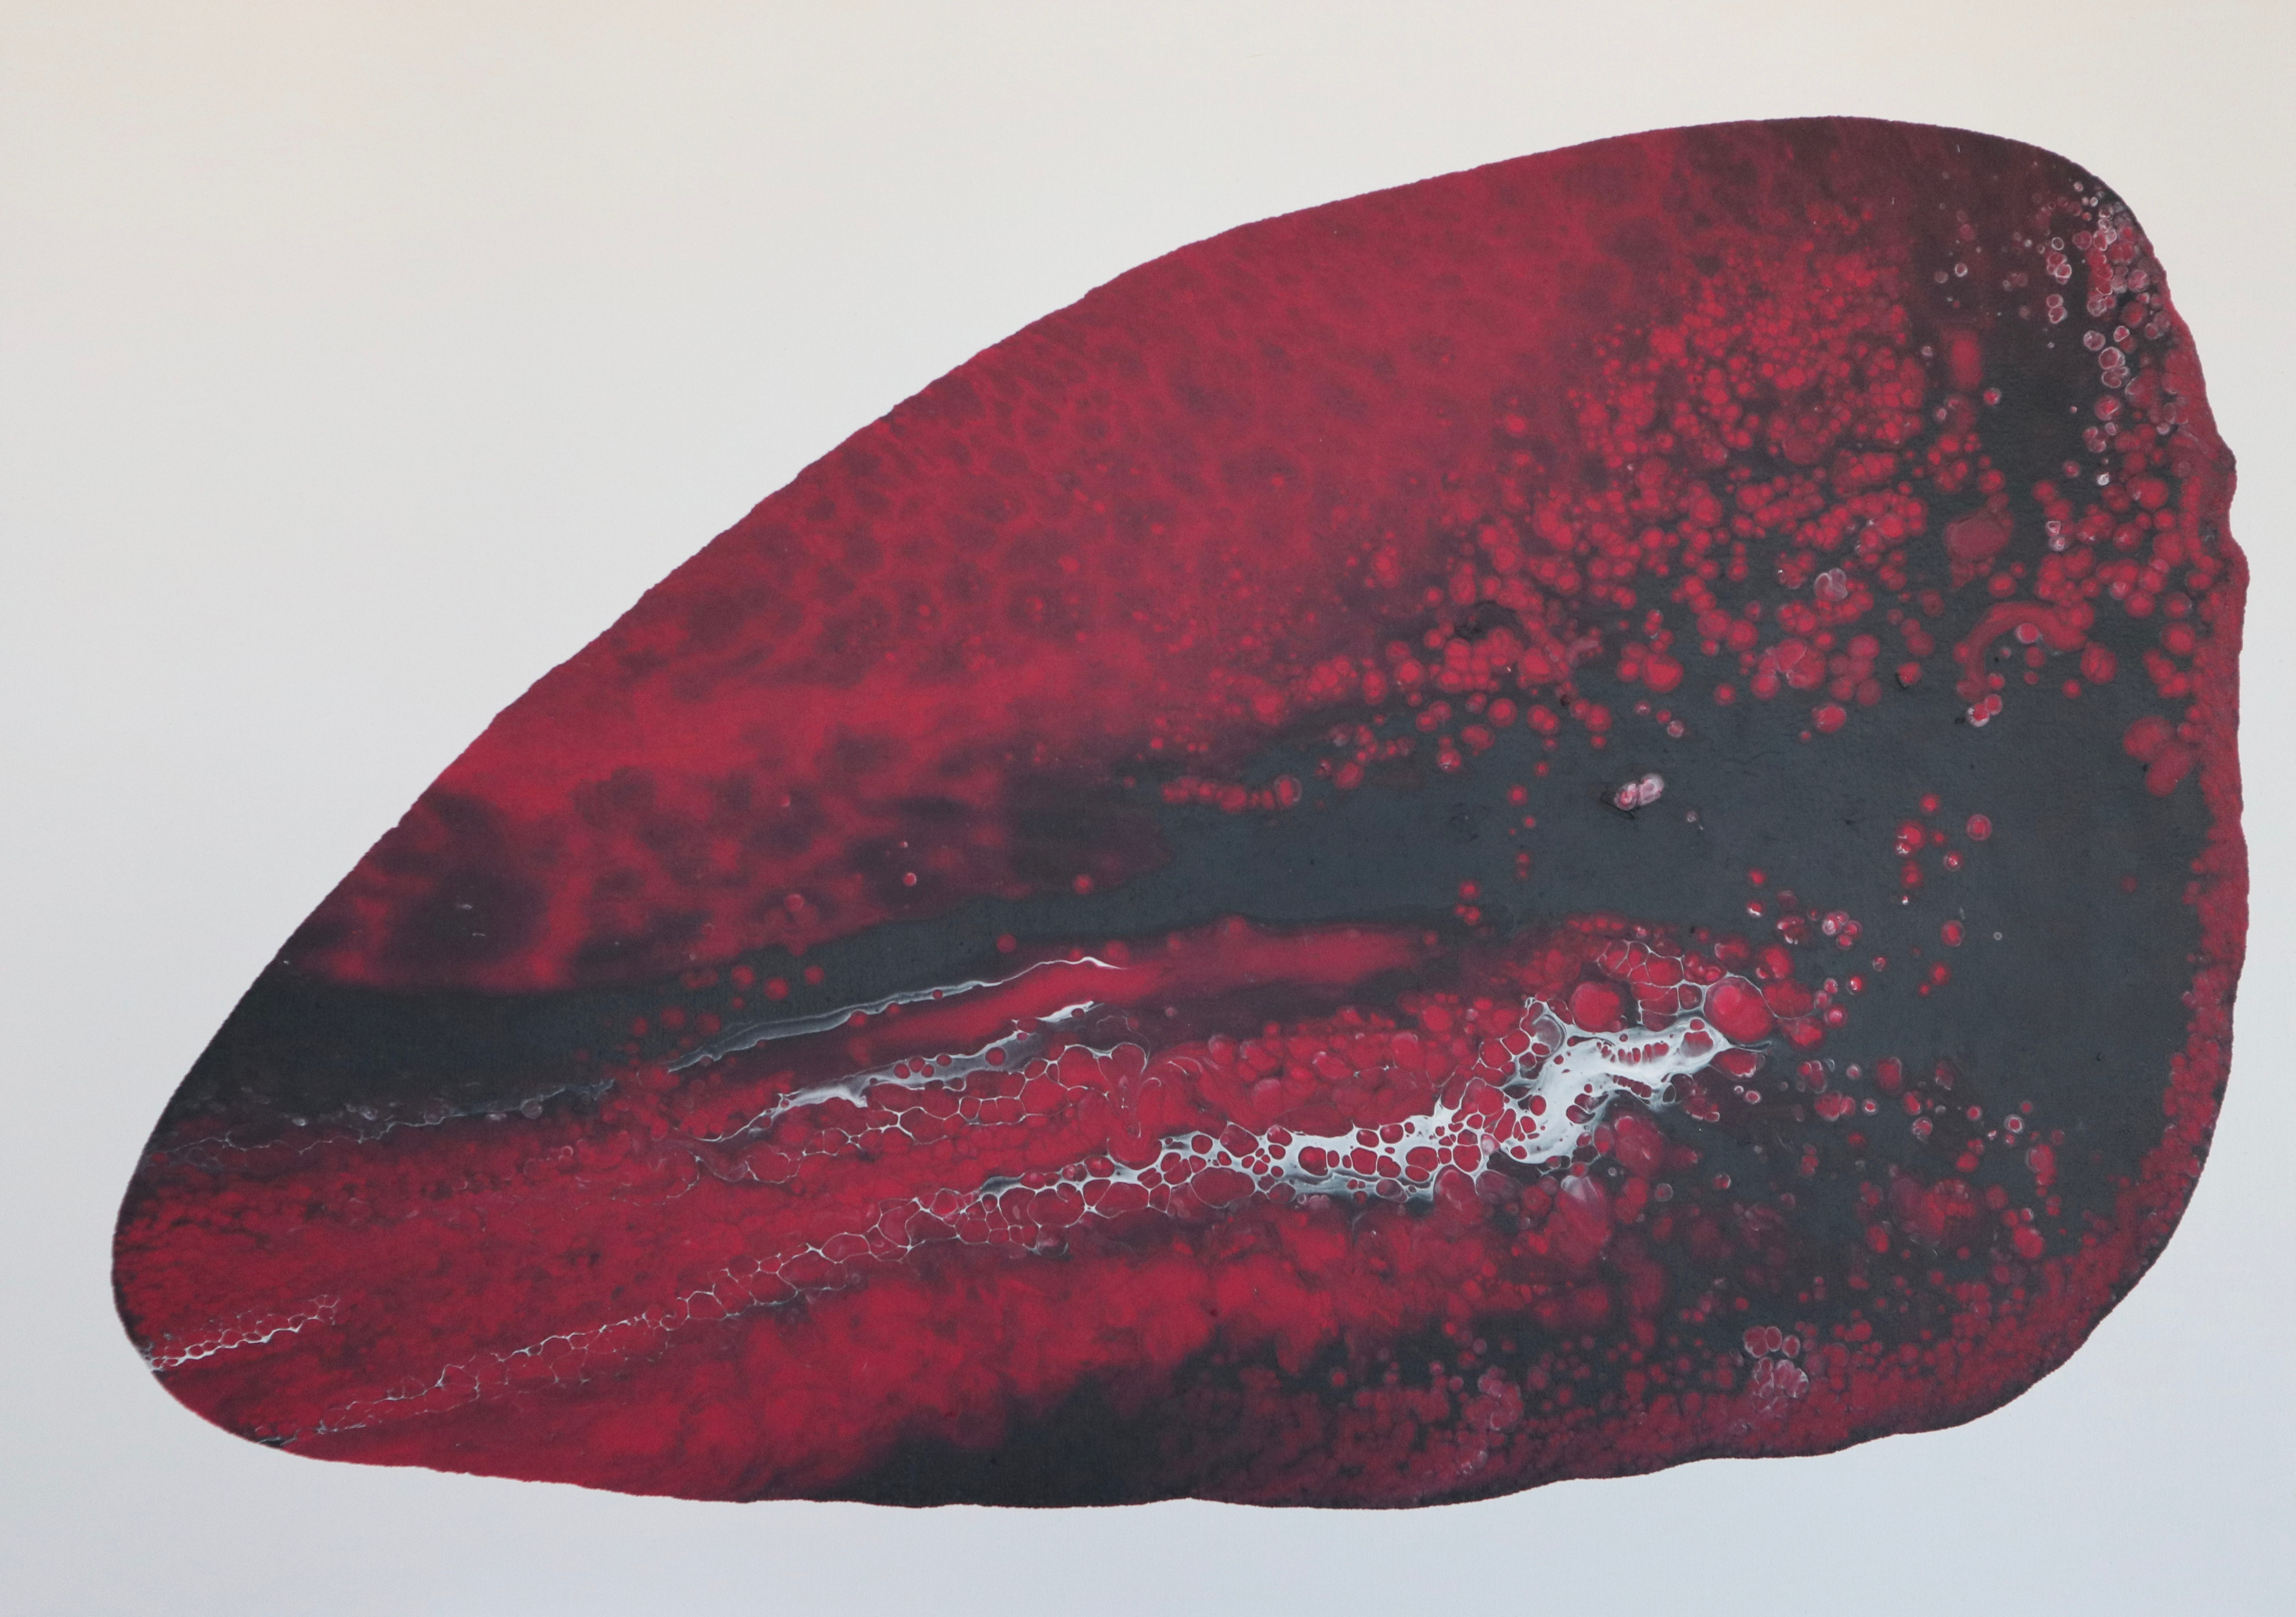 Rouge étrange - Sophius